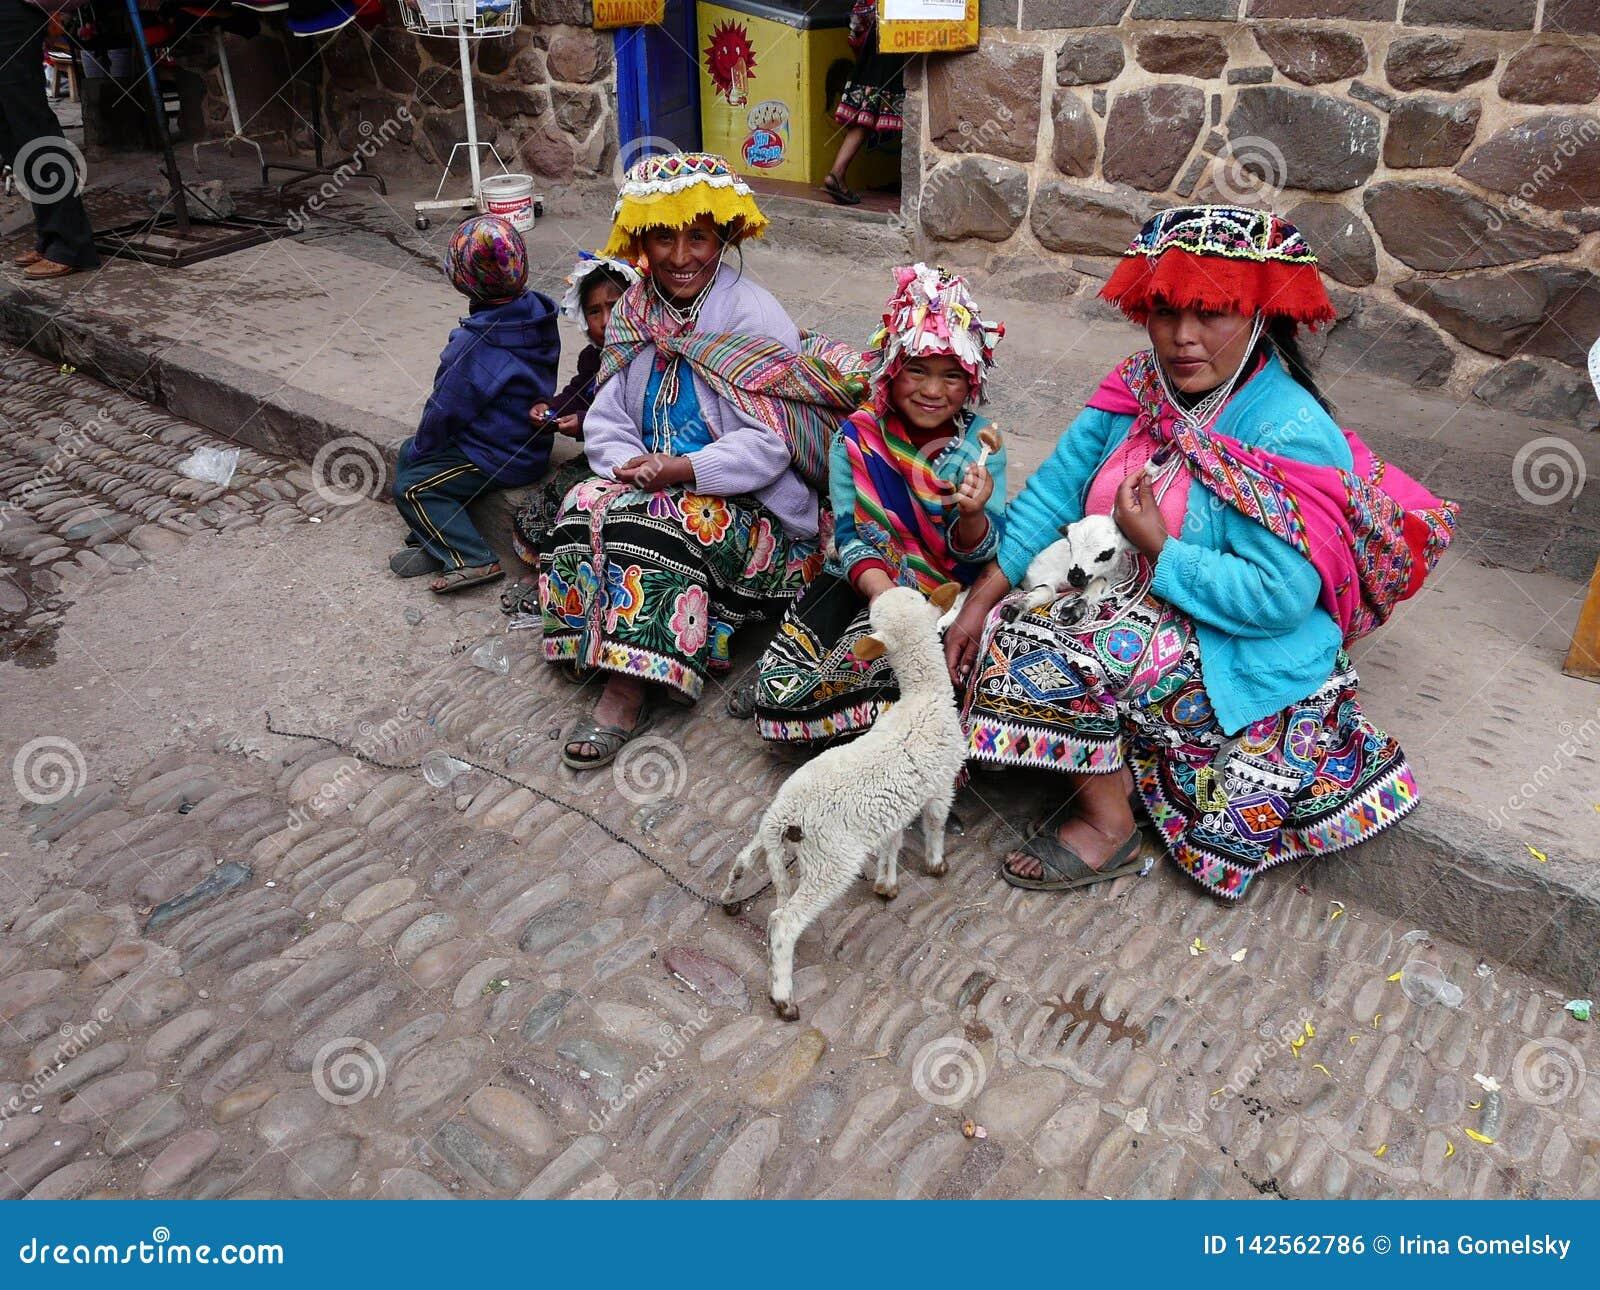 Women in traditional Peruvian clothing in the village of Pisac, Peru